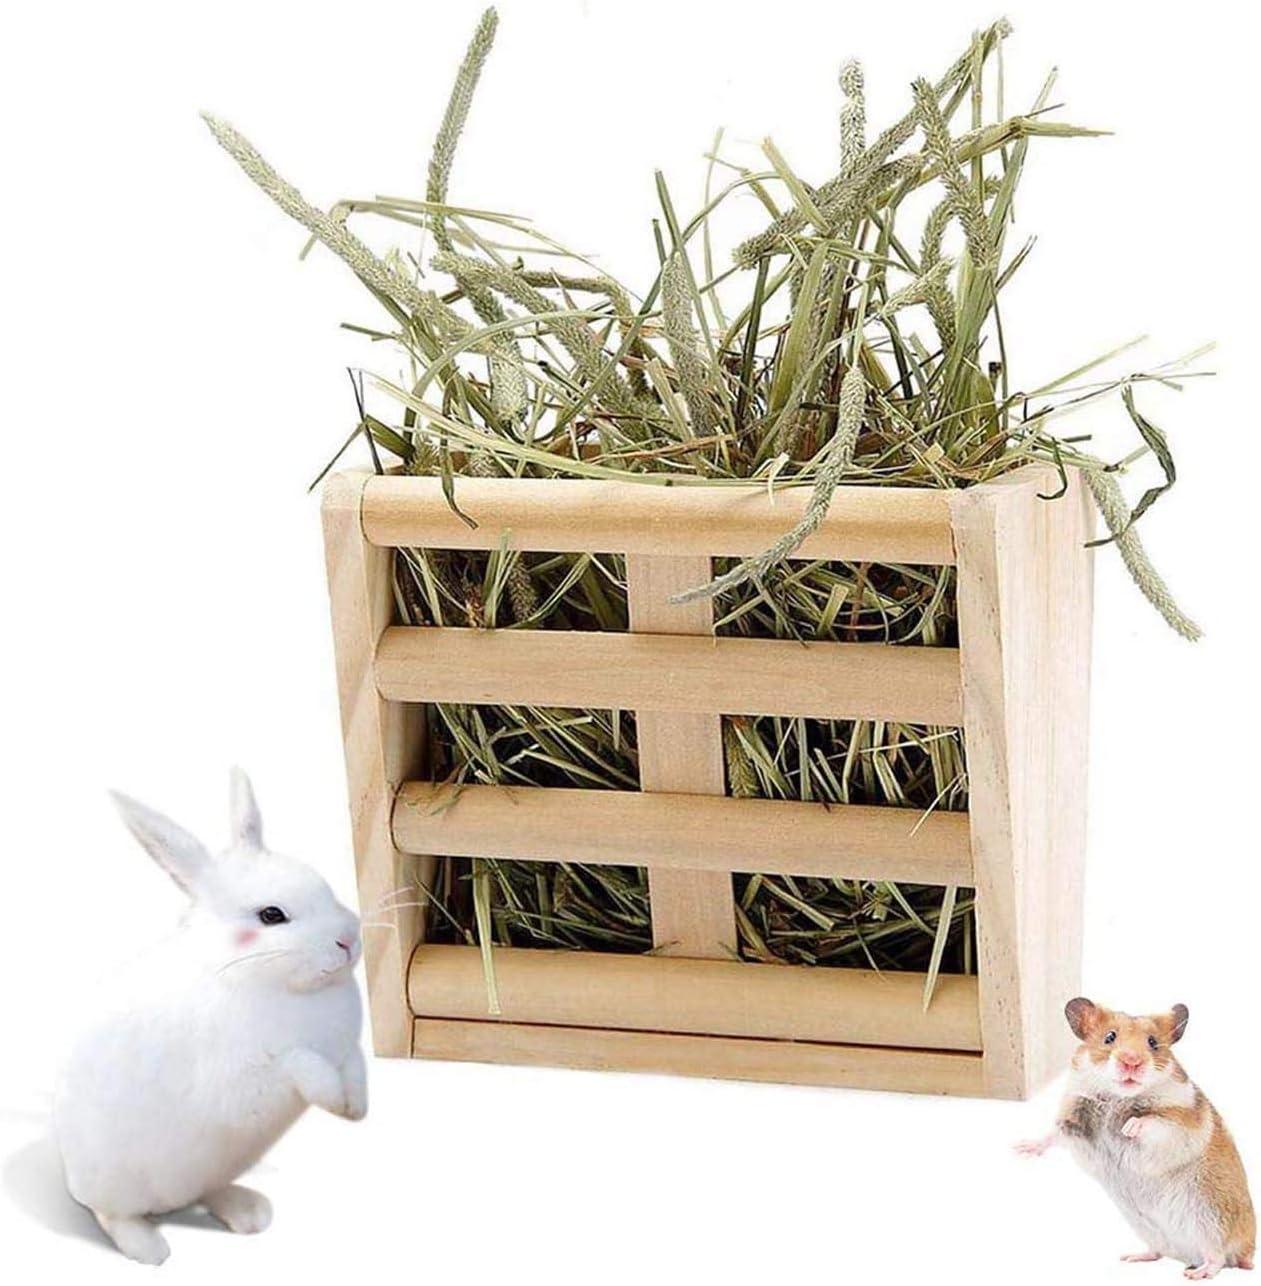 Chinchilla Hay Rack,Bunny Hay Feeder,Guinea Pig Hay Holder,Rabbit Food Dispenser,Natural Wooden,Hamster,Rabbit Cage Accessories by BLSMU